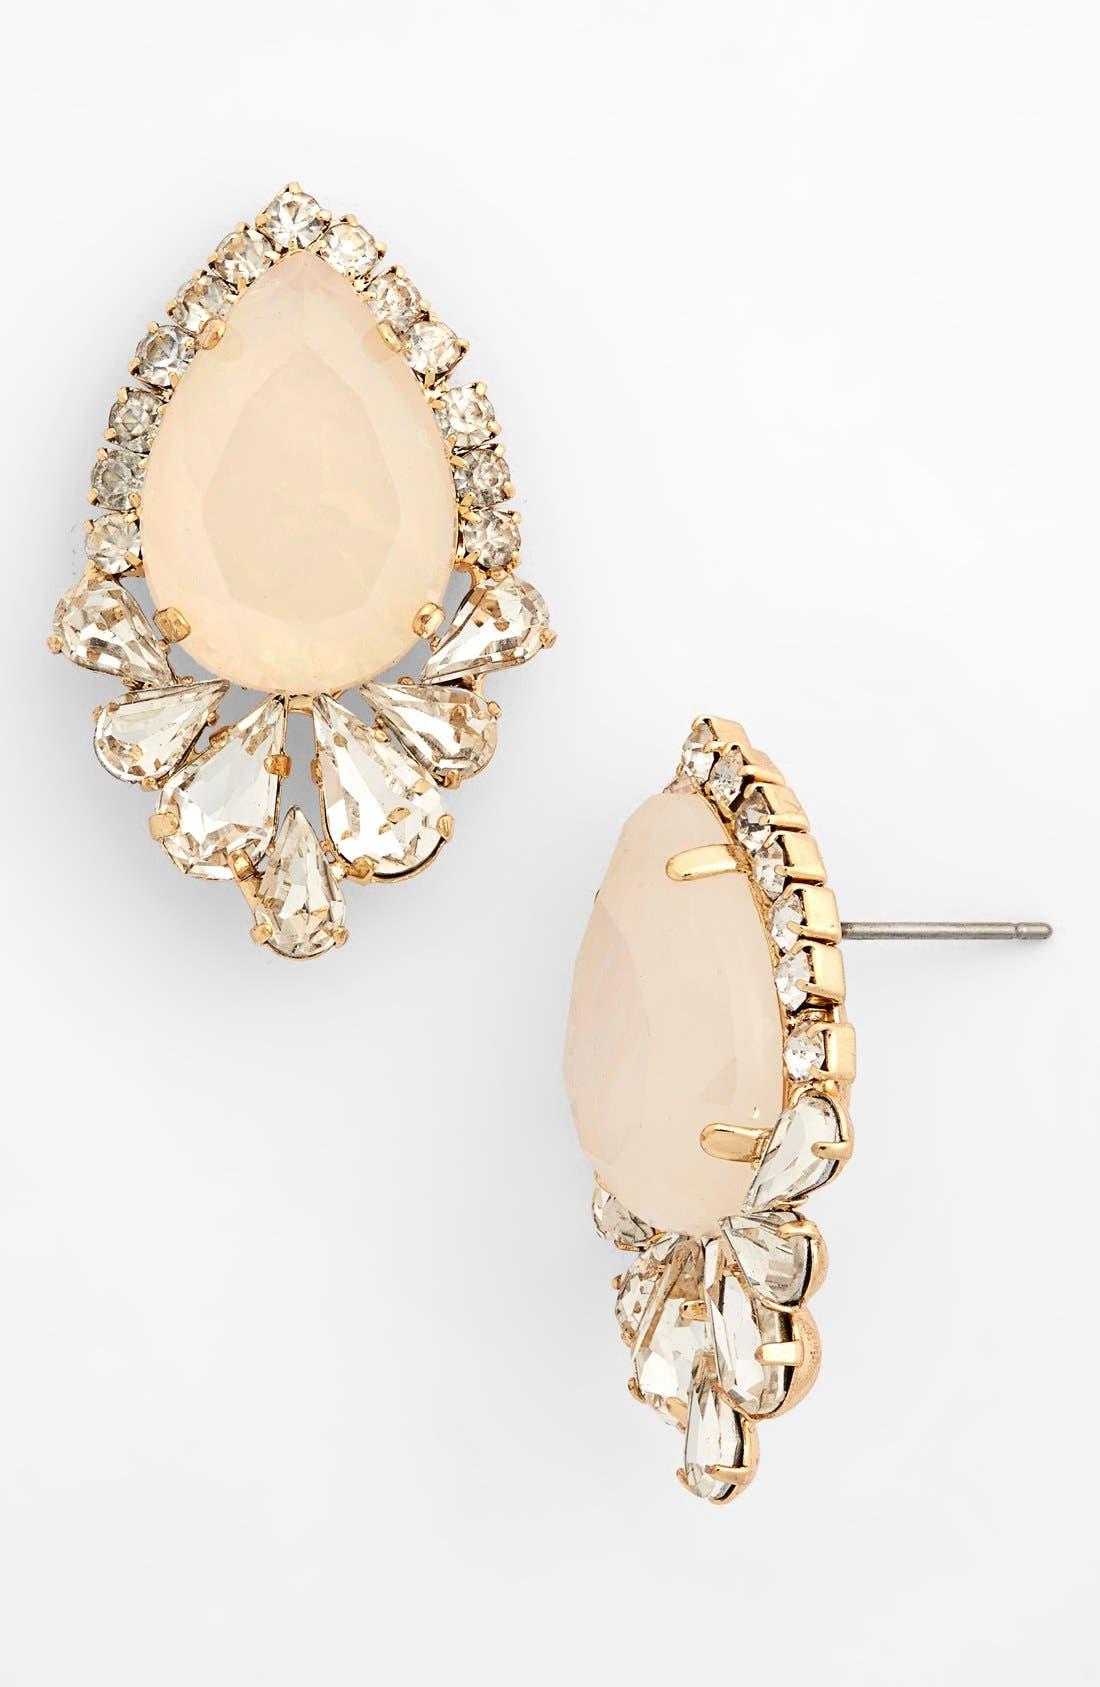 Crystal Framed Teardrop Stud Earrings,                             Main thumbnail 1, color,                             Crystal